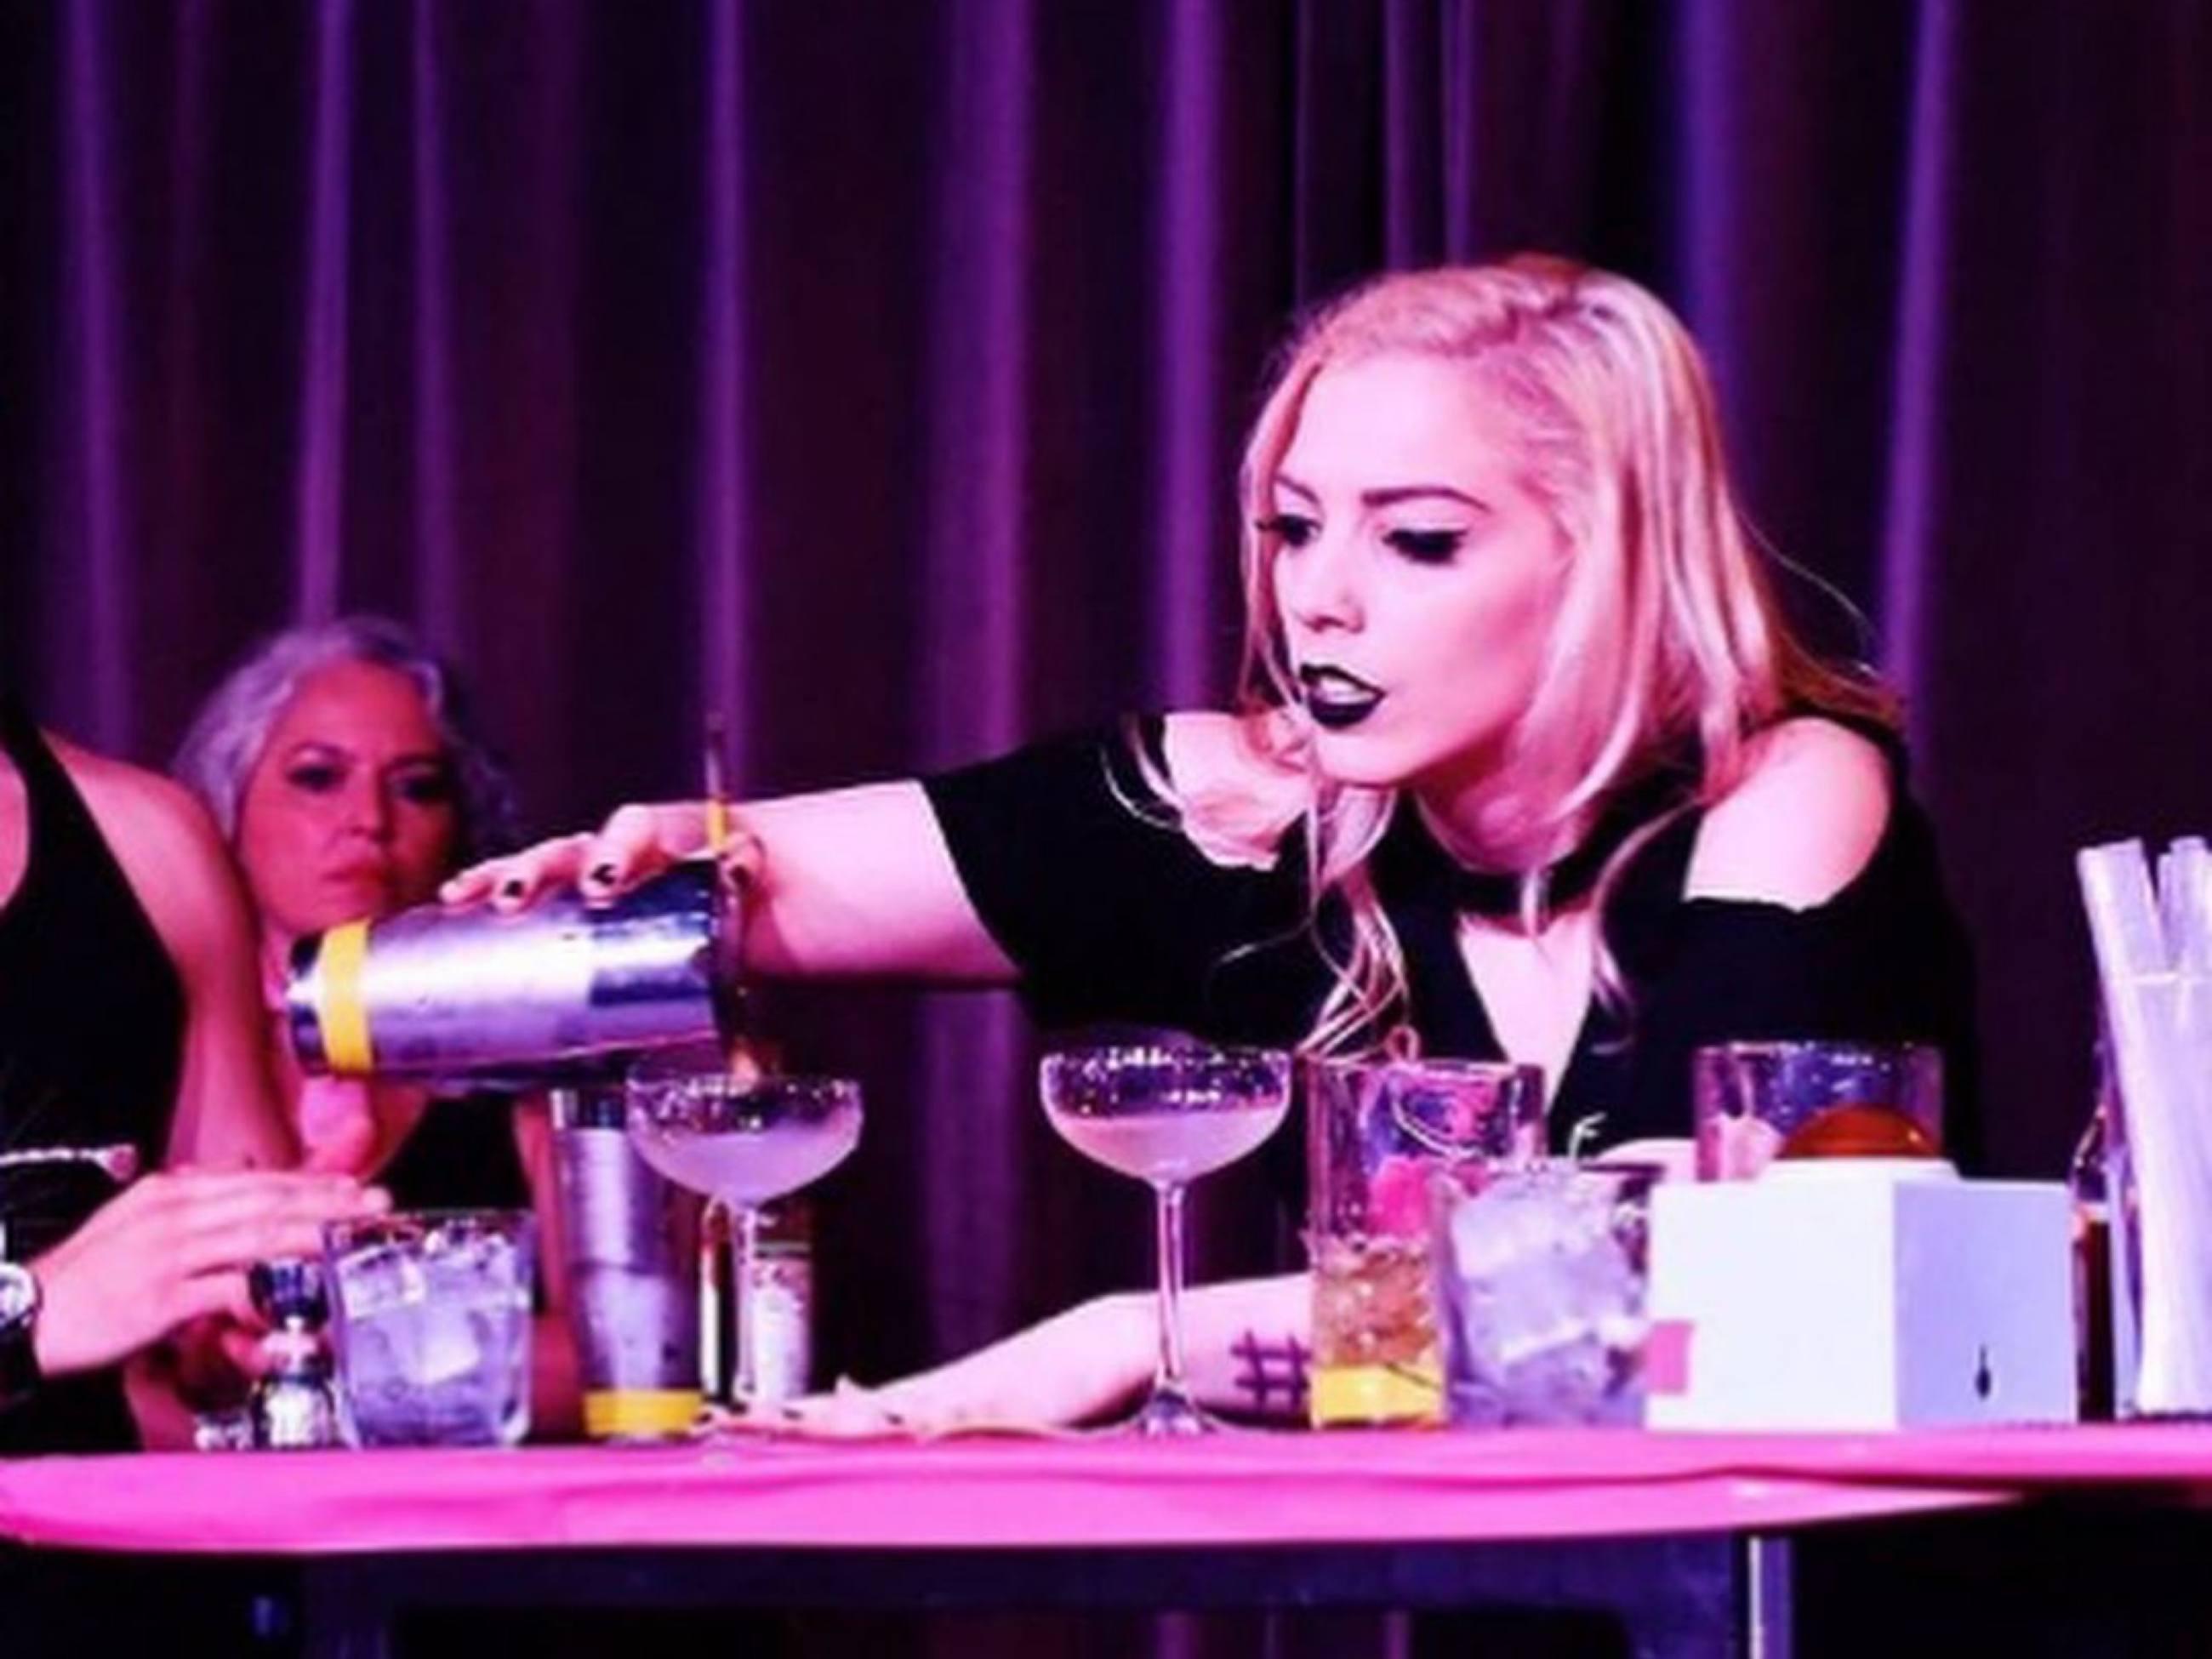 LA bartender Kat Corbo on her way to winning Speed Rack 2019